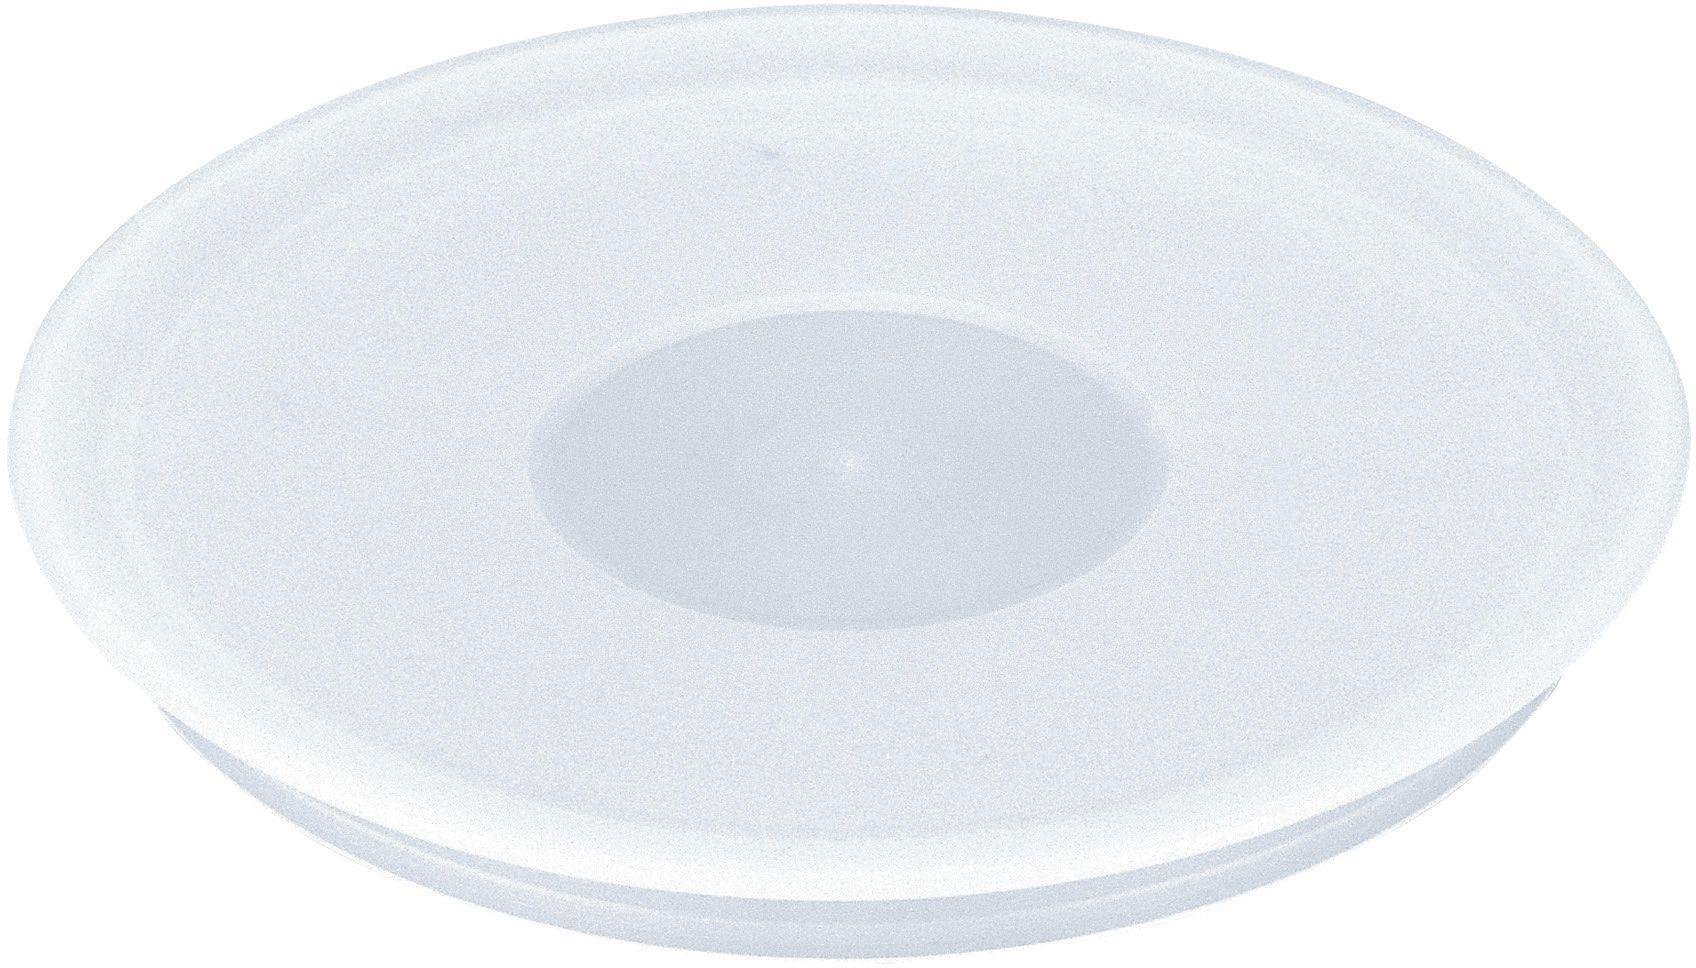 Tefal Ingenio 24cm Plastic Saucepan Lid